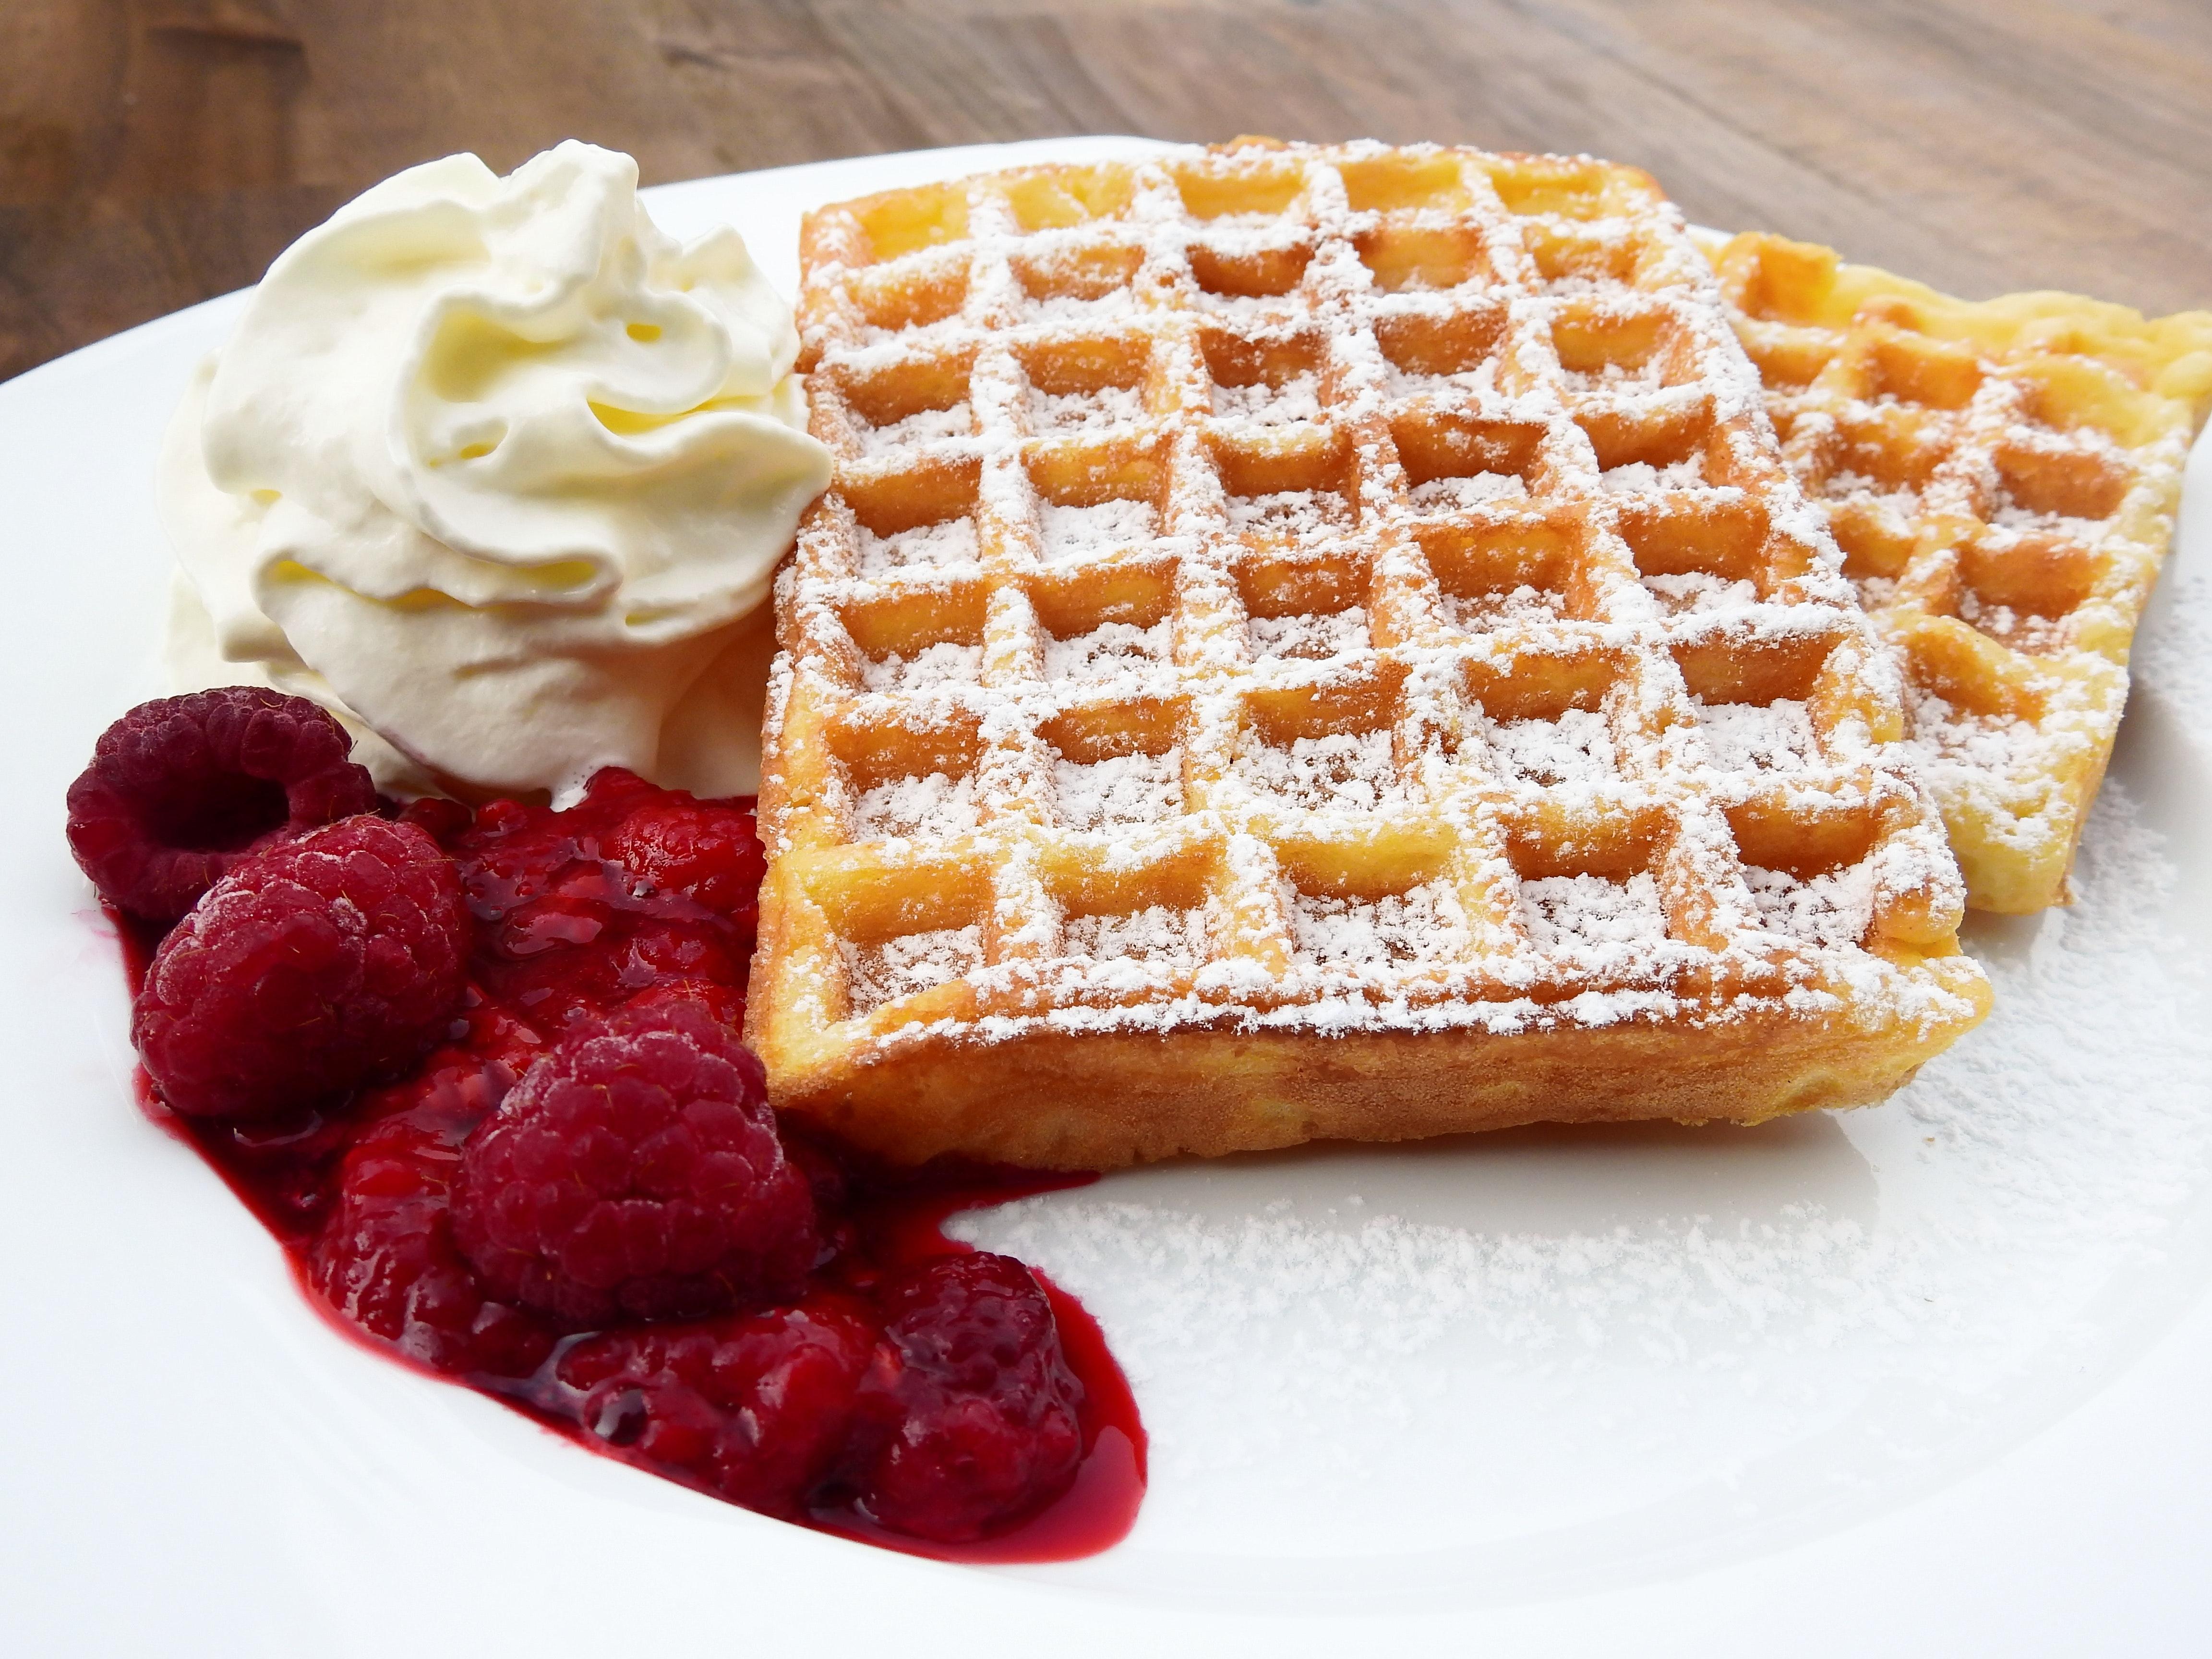 Waffle beside cherry and ice cream photo